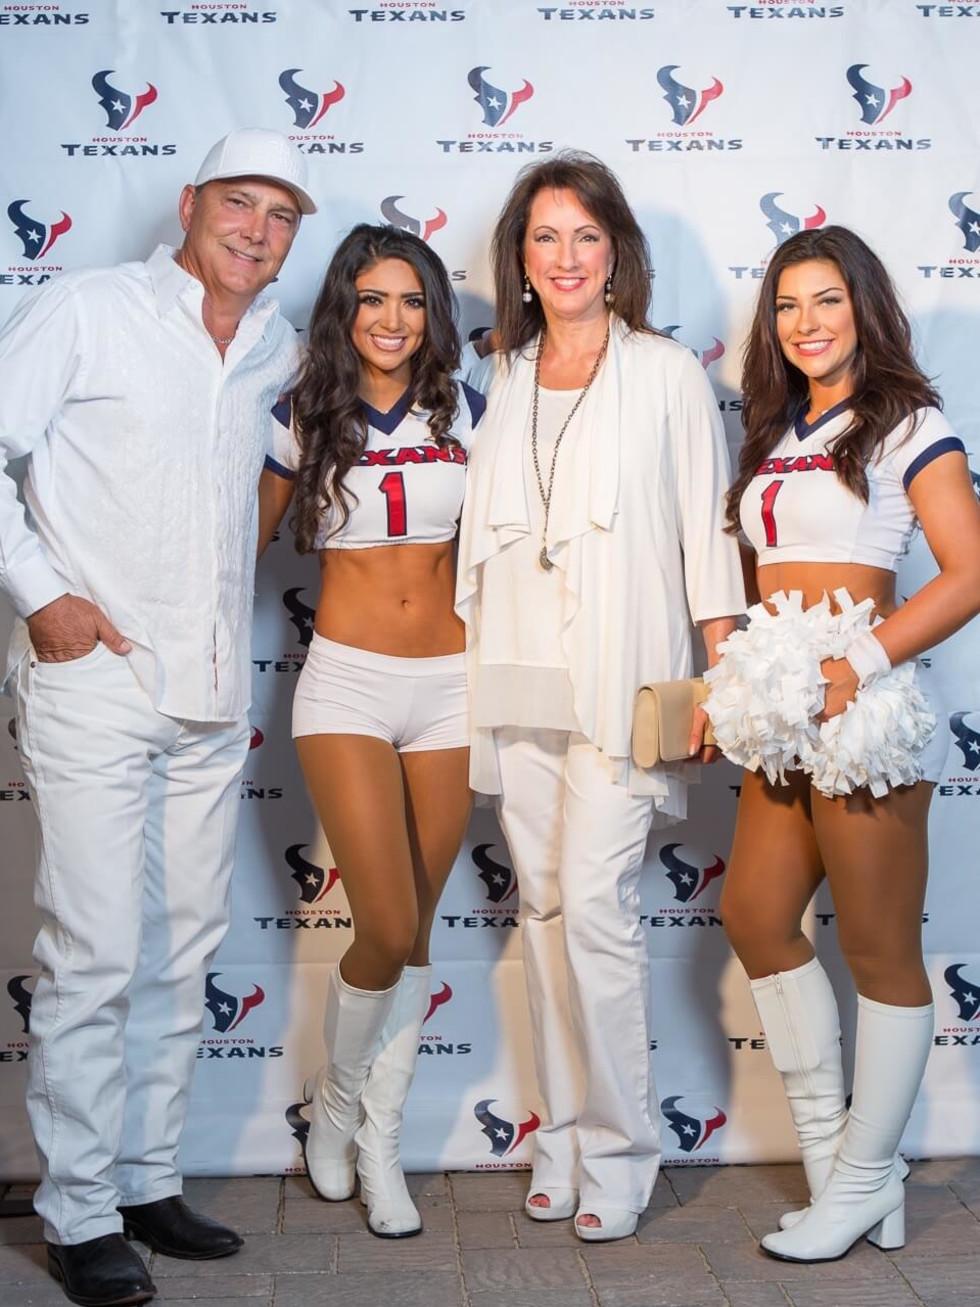 Loya Texans White Out party, 9/16 Lance Smith, Alicia Smith